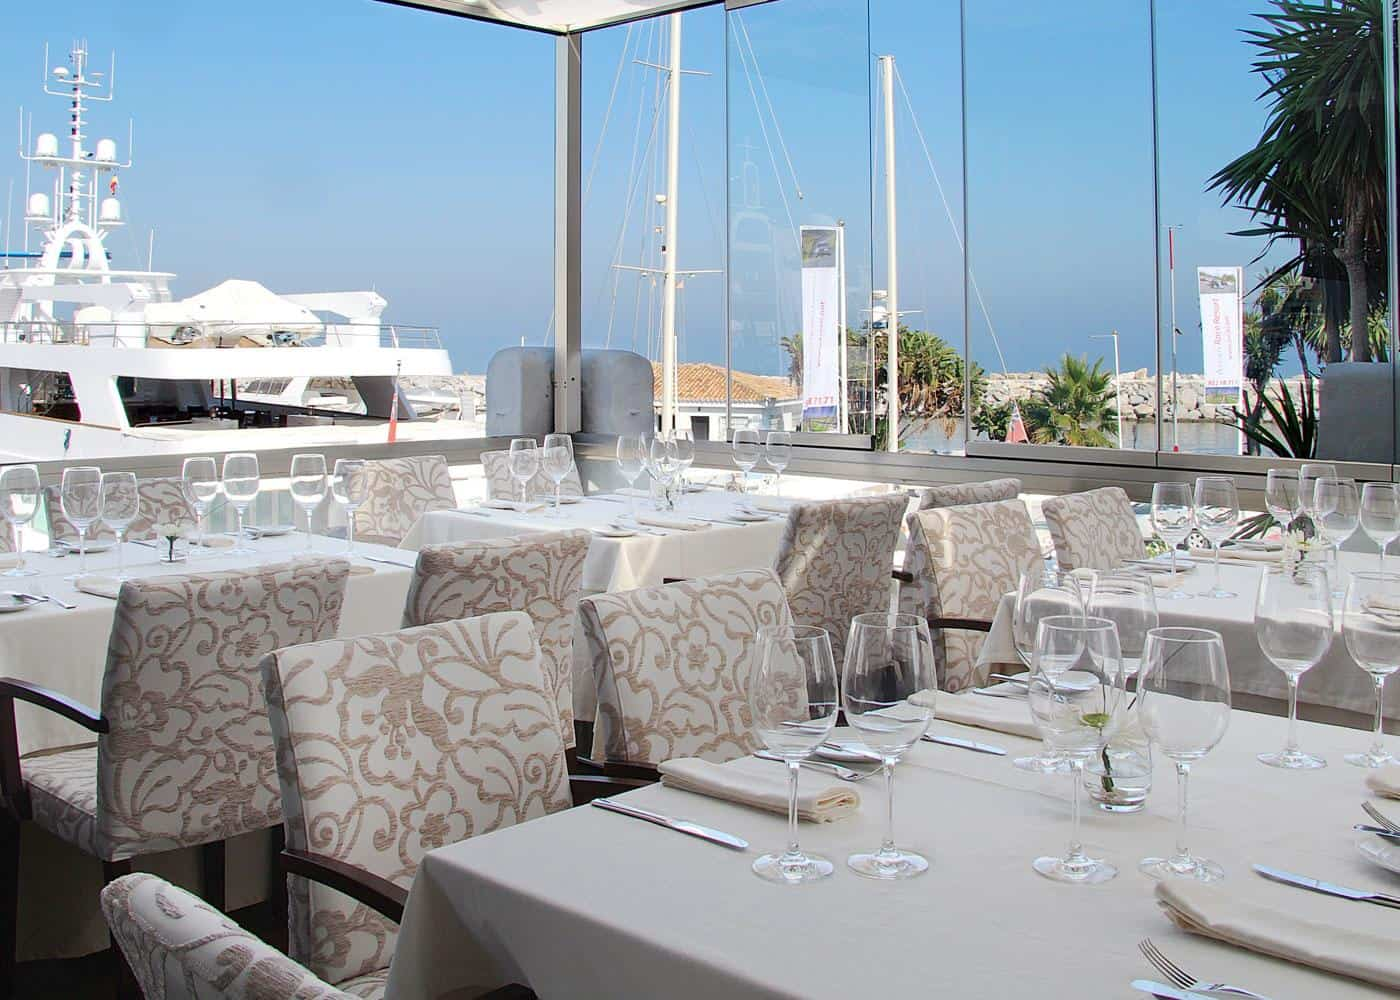 Restaurant El Gran Gatsby